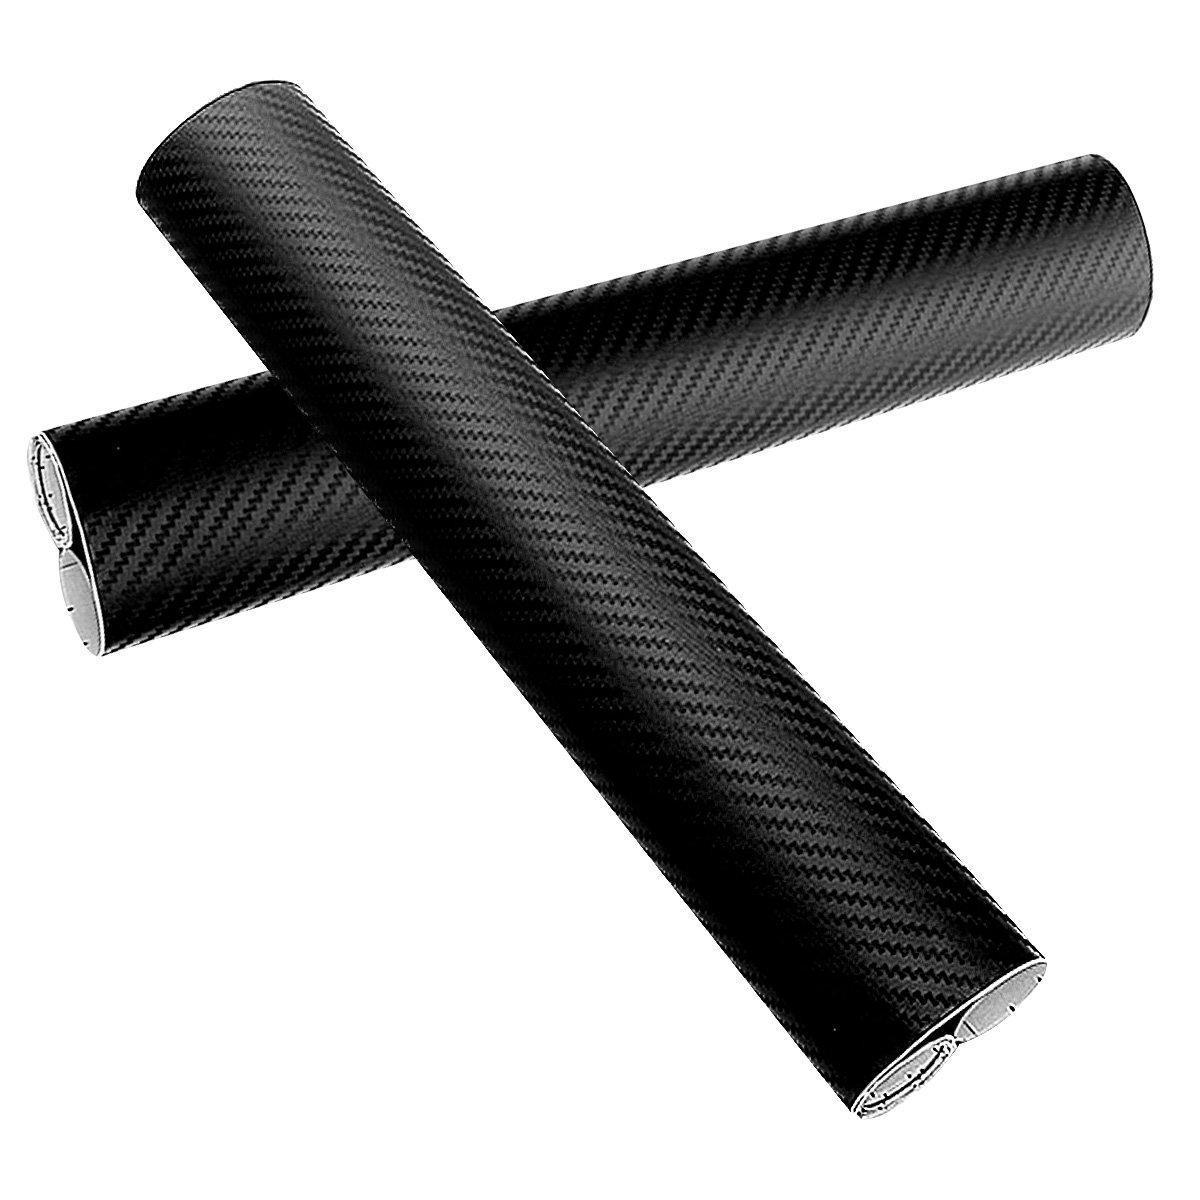 Audew Carbon Fiber Vinyl Wrap Car Film Sticker Decal Wrapping 3D Black Sheet Roll DIY 130x30cm 2 Pcs AUDEWXKd8Zmakl